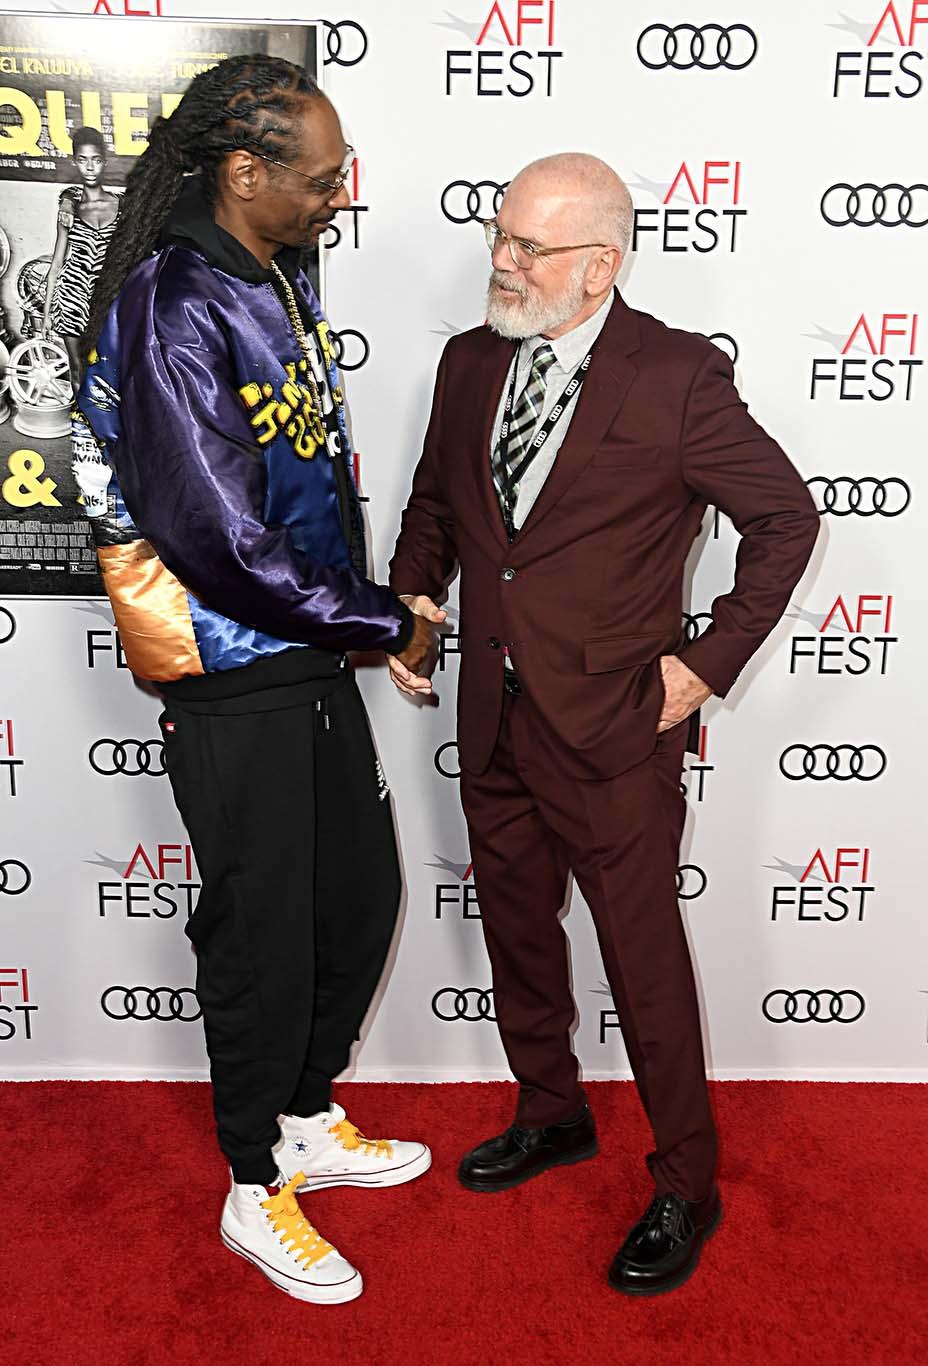 Snoop Dogg and AFI Festivals Director Michael Lumpkin